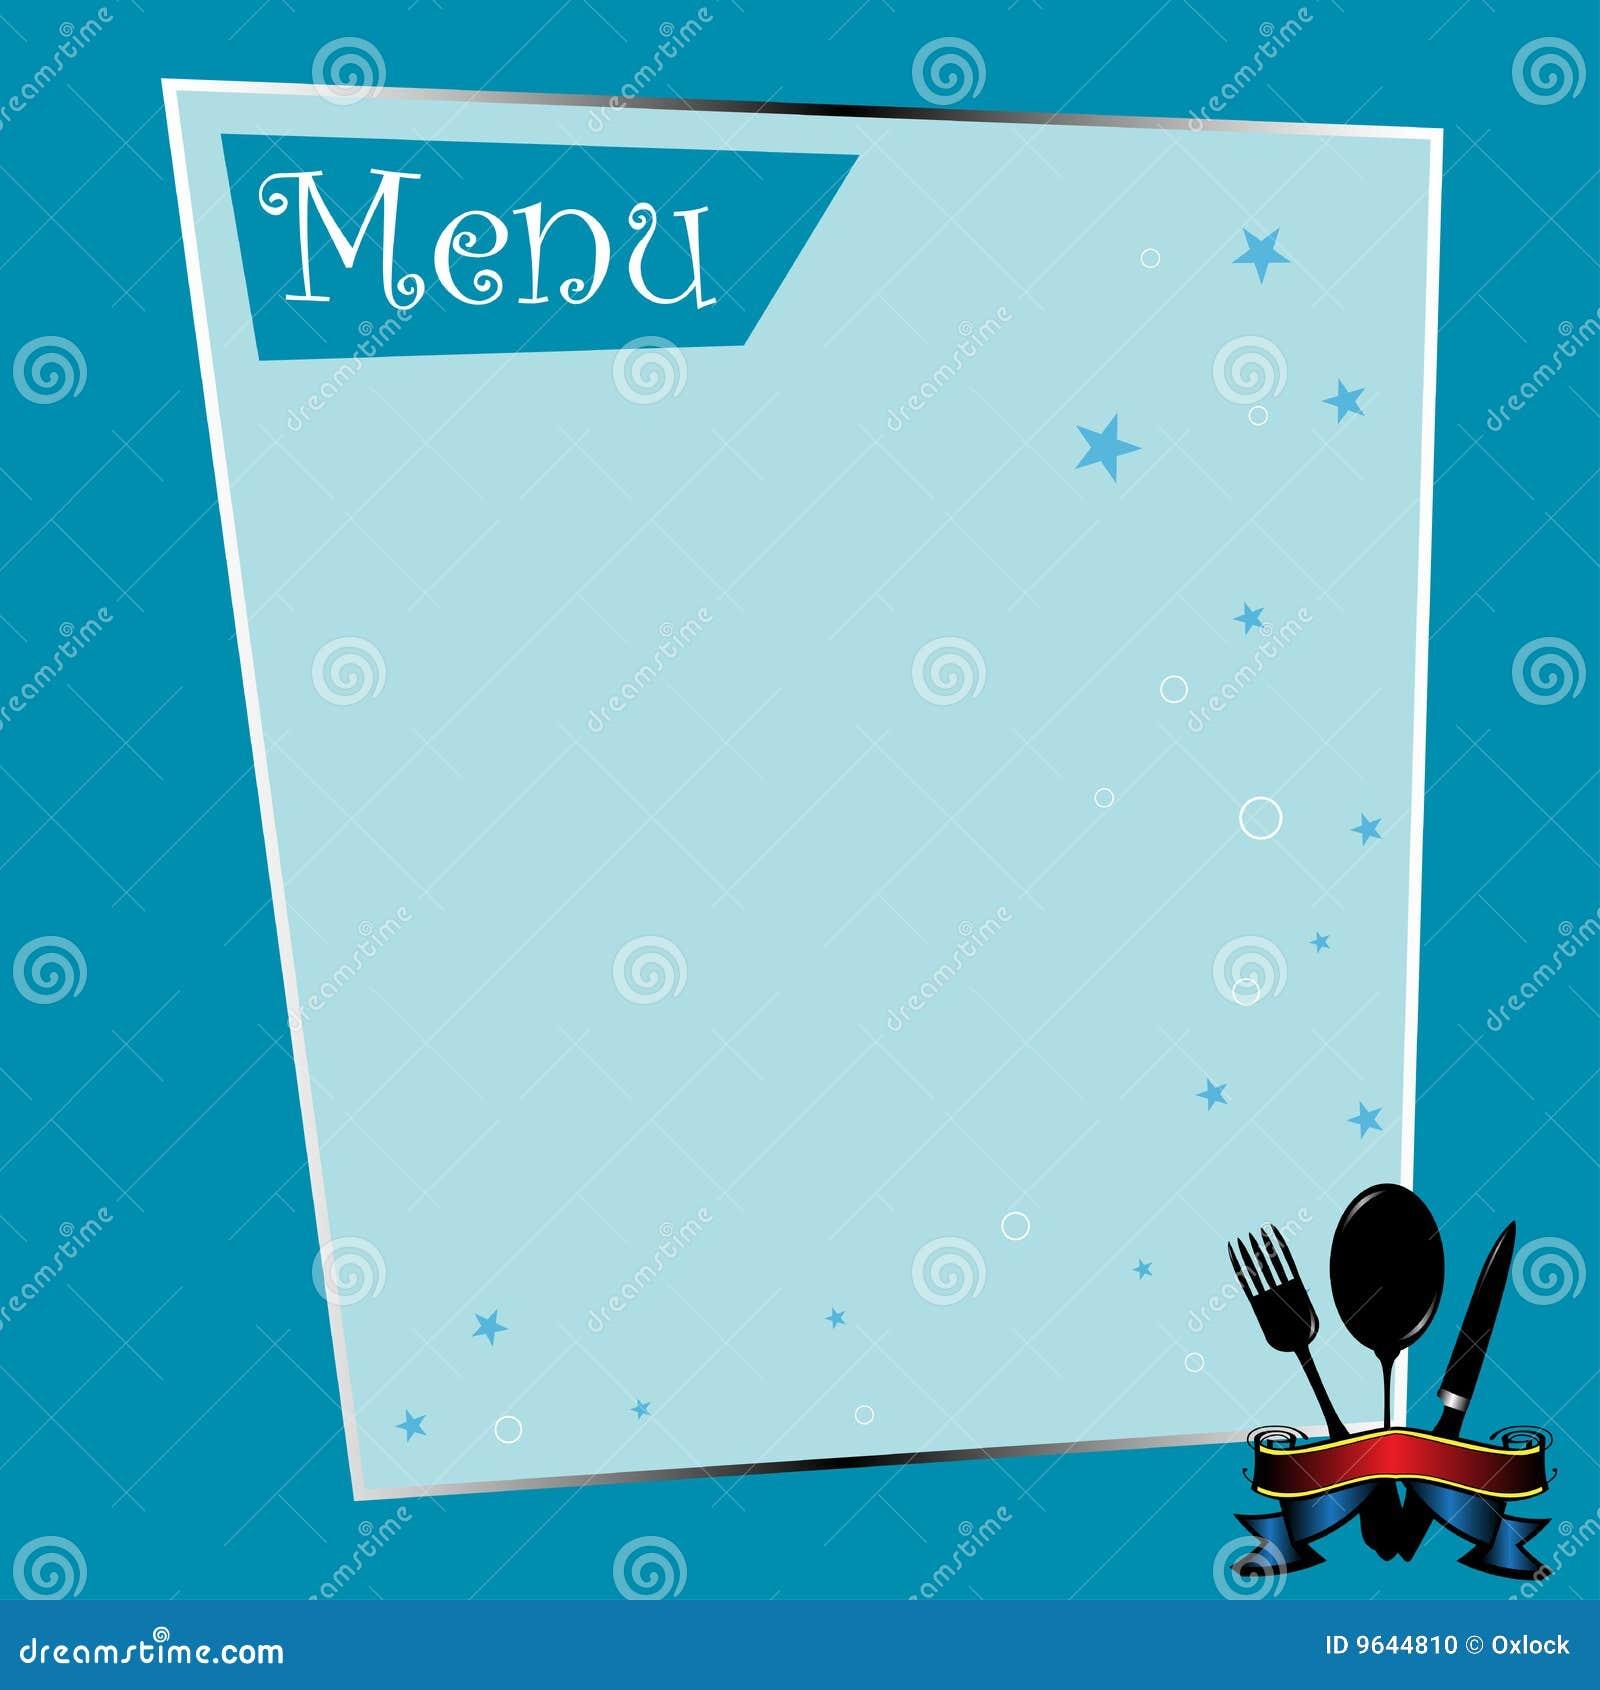 restaurant menu template word